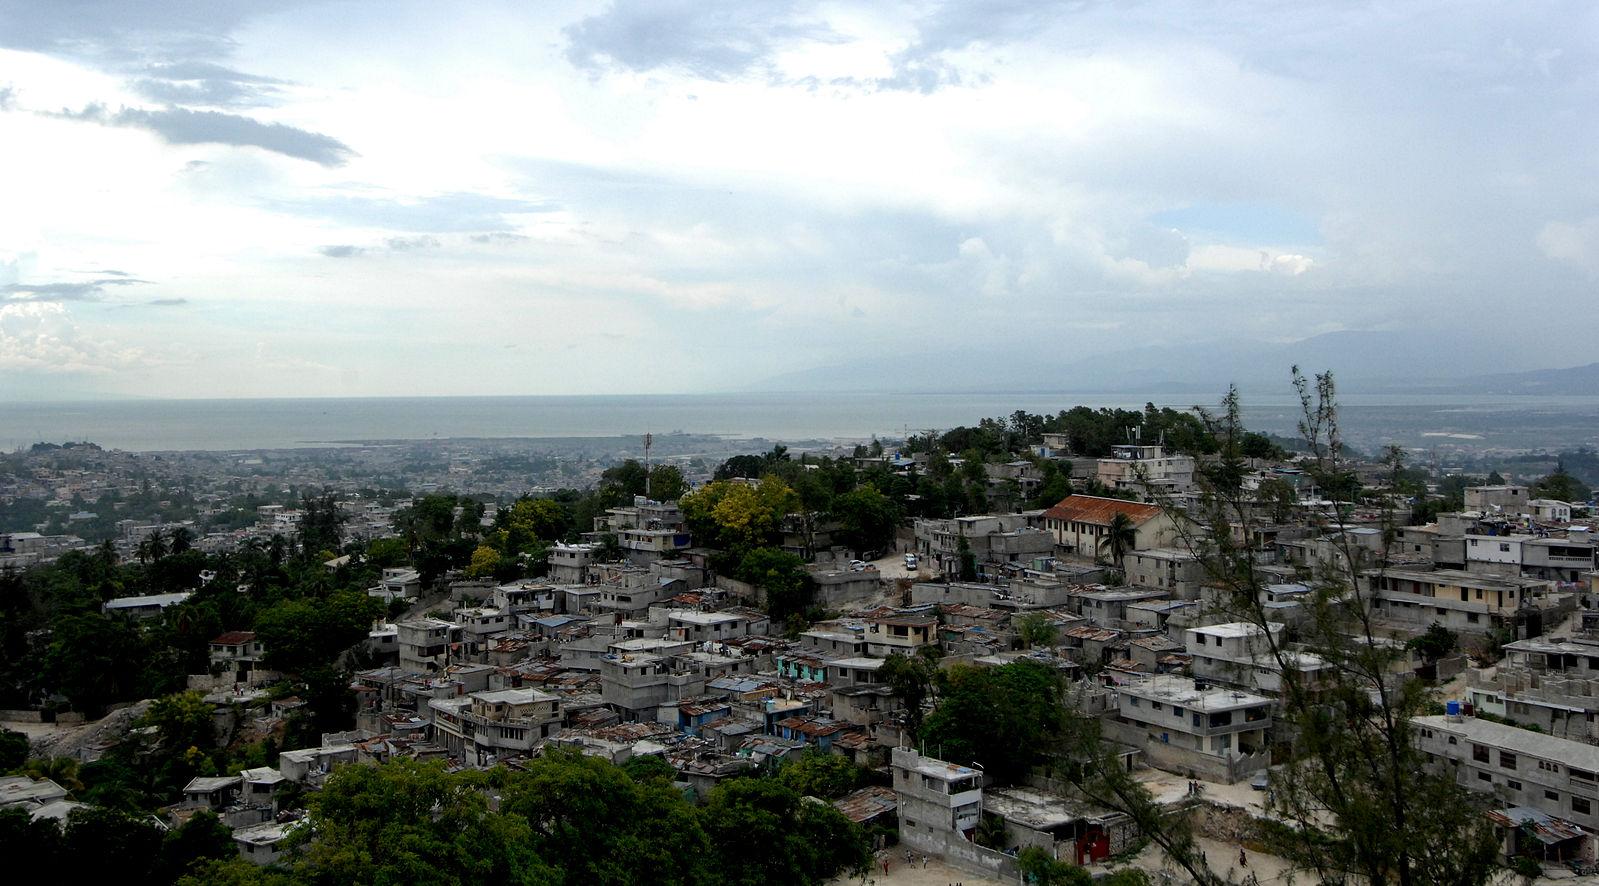 Port-au-Prince, Haiti. Source: https://commons.wikimedia.org